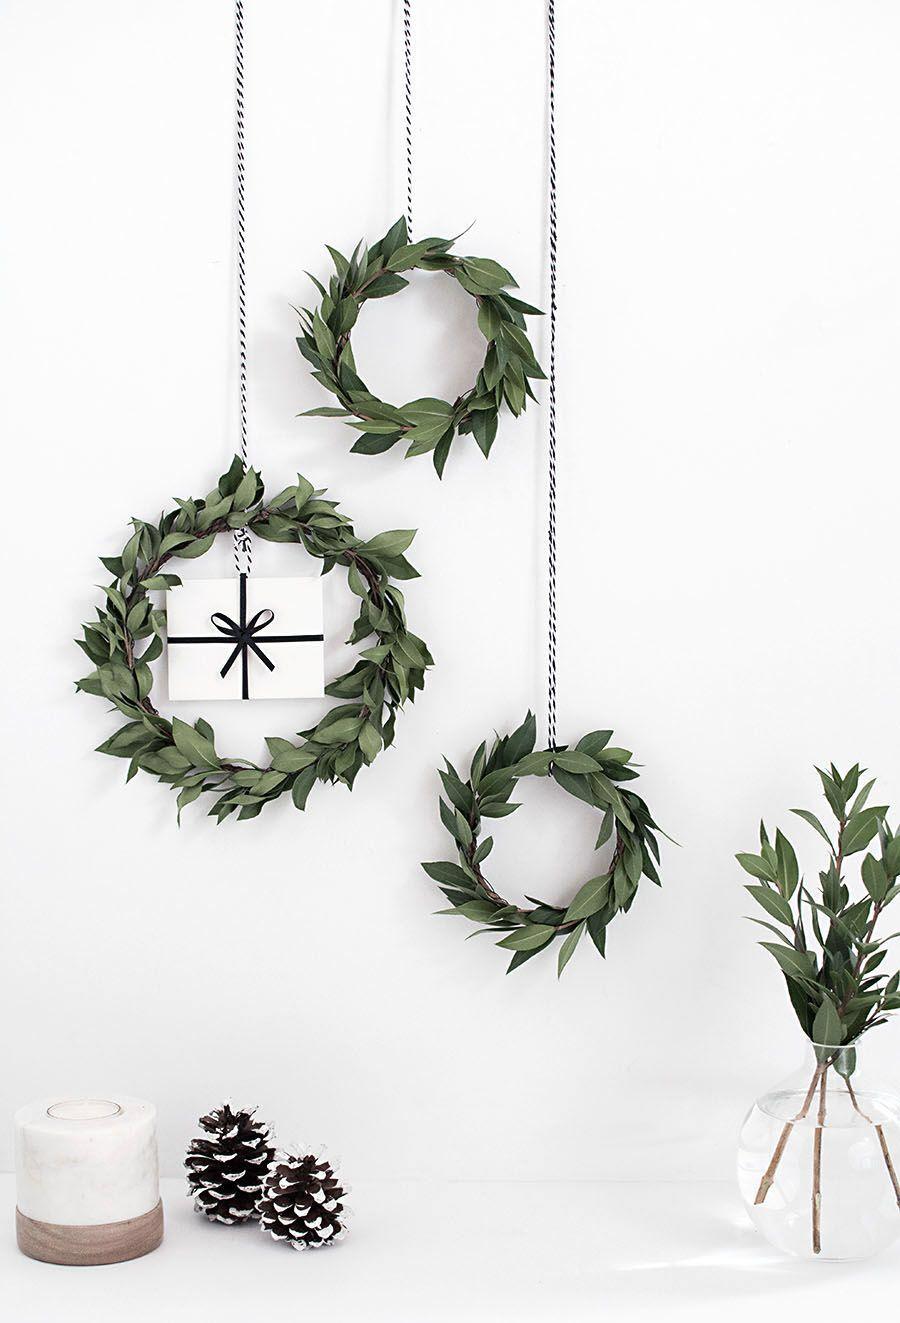 19 Minimalist Christmas Decorations To Diy This Weekend Minimalist Christmas Christmas Wreaths Diy Minimalist Holiday Decor